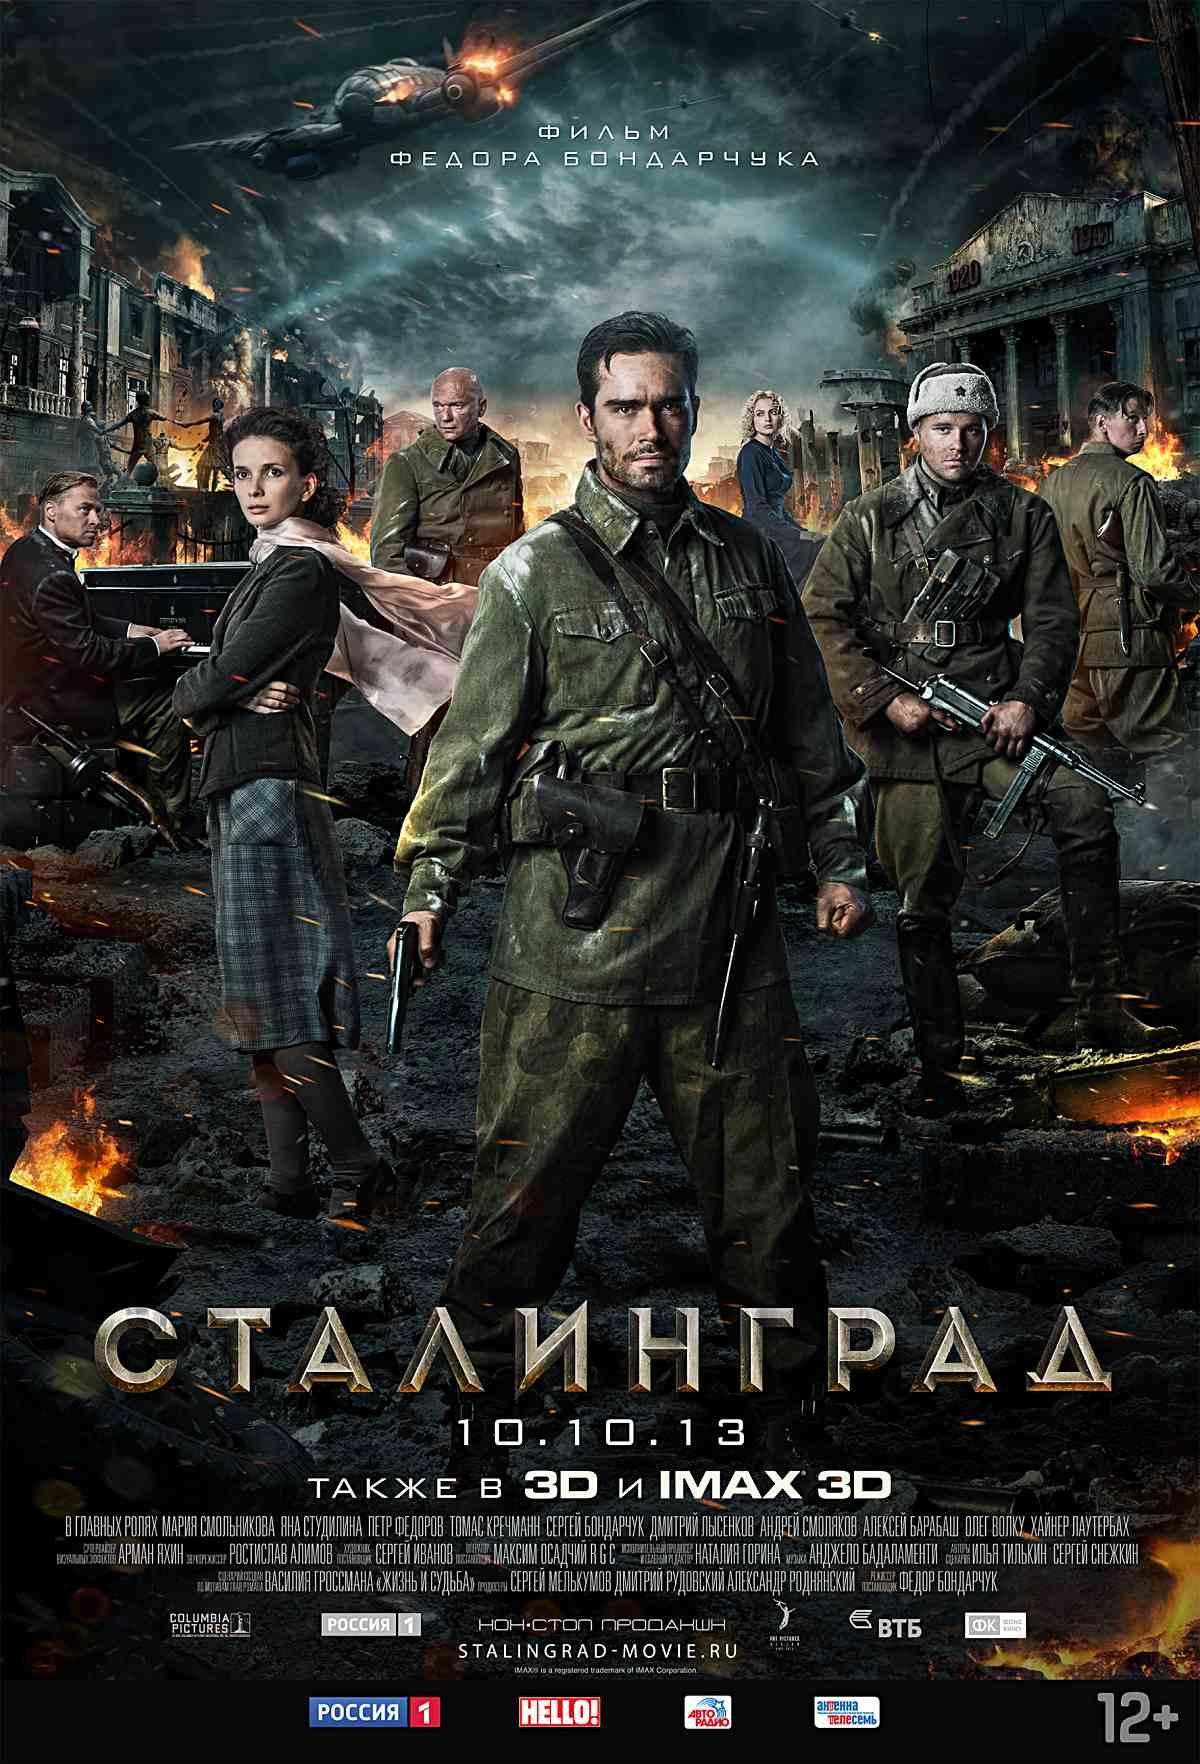 Сталинград [2013]